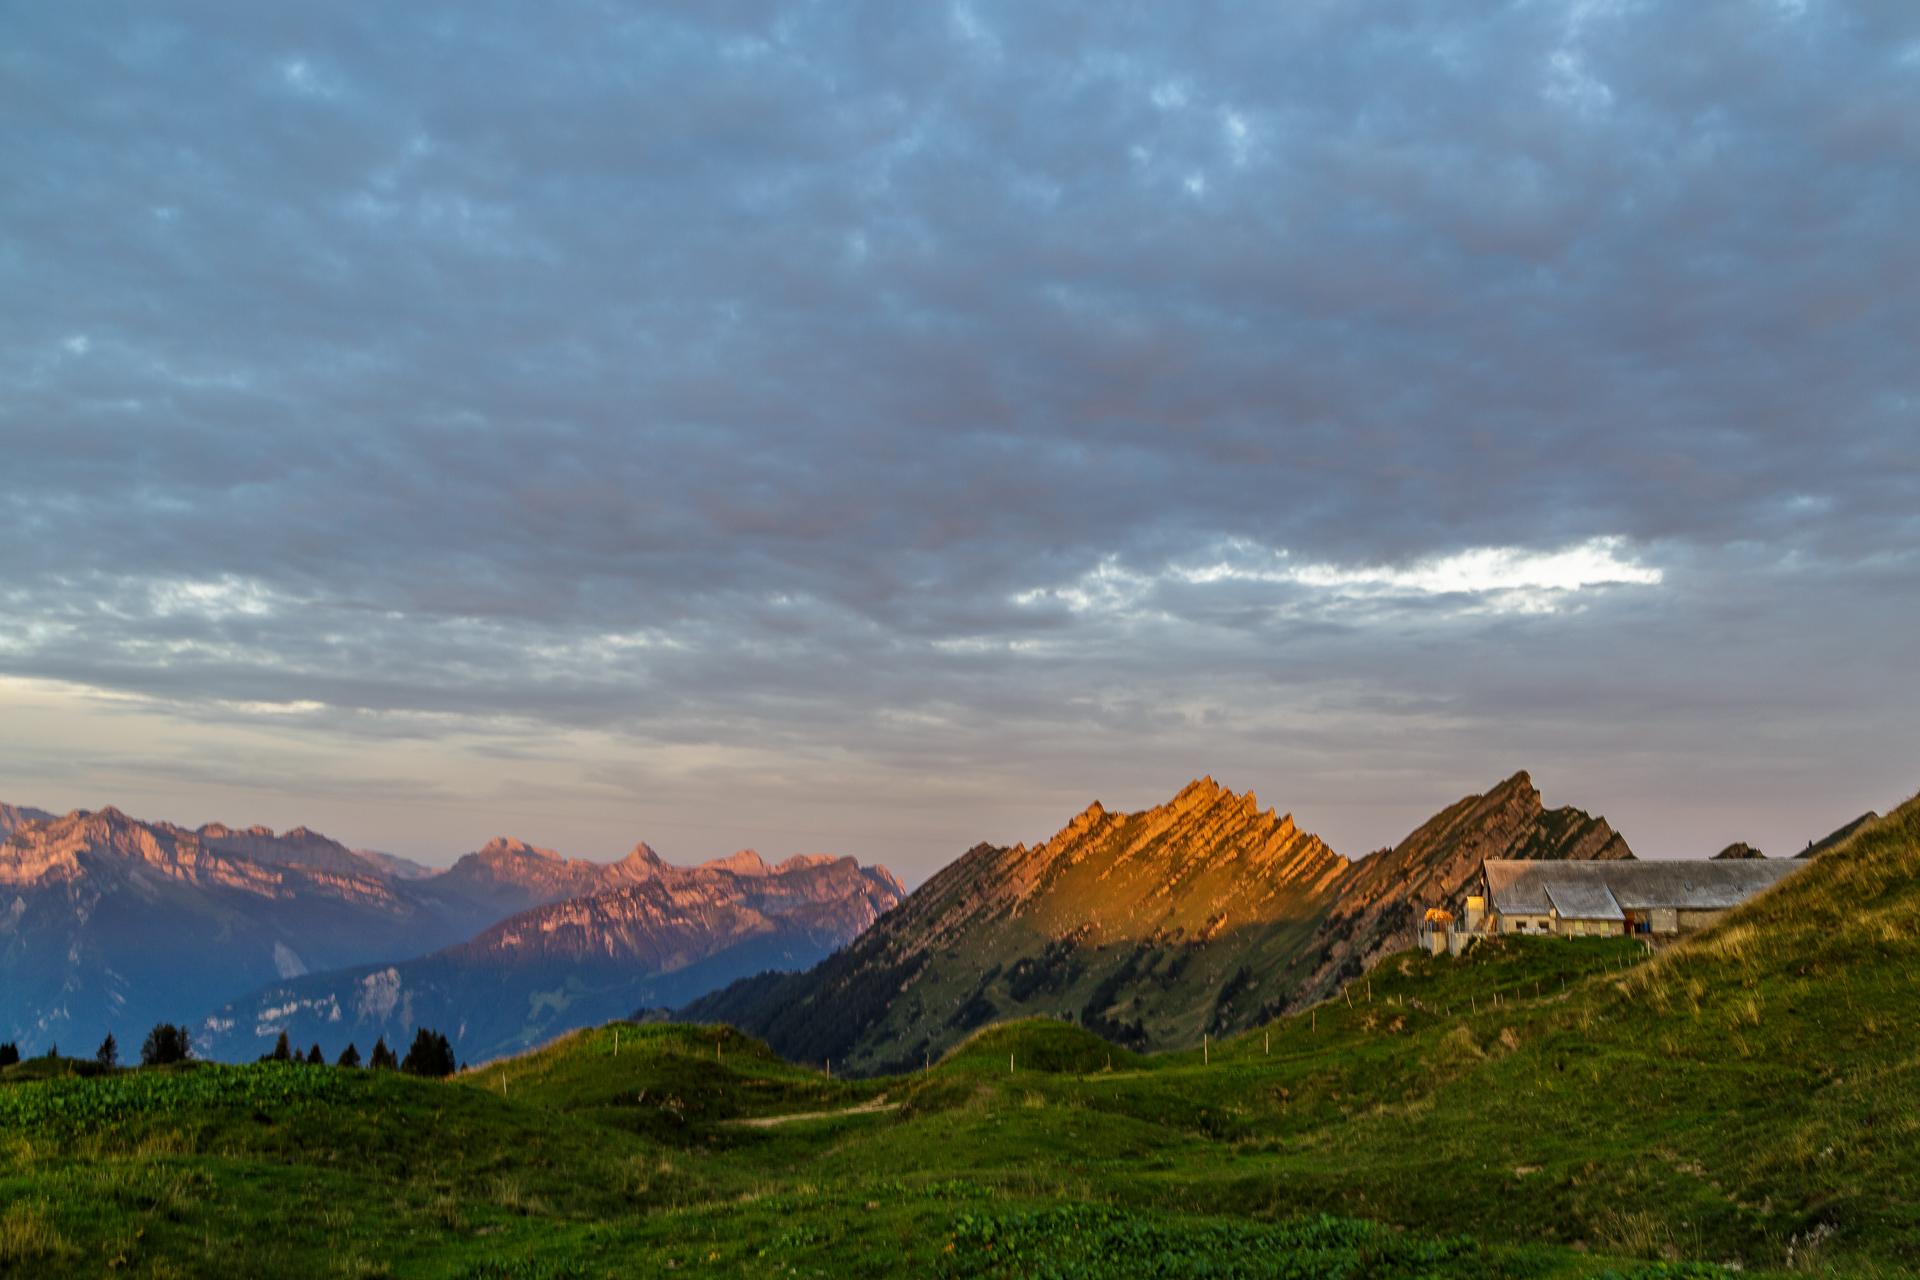 Alp-Oberchaeseren-Speer-2